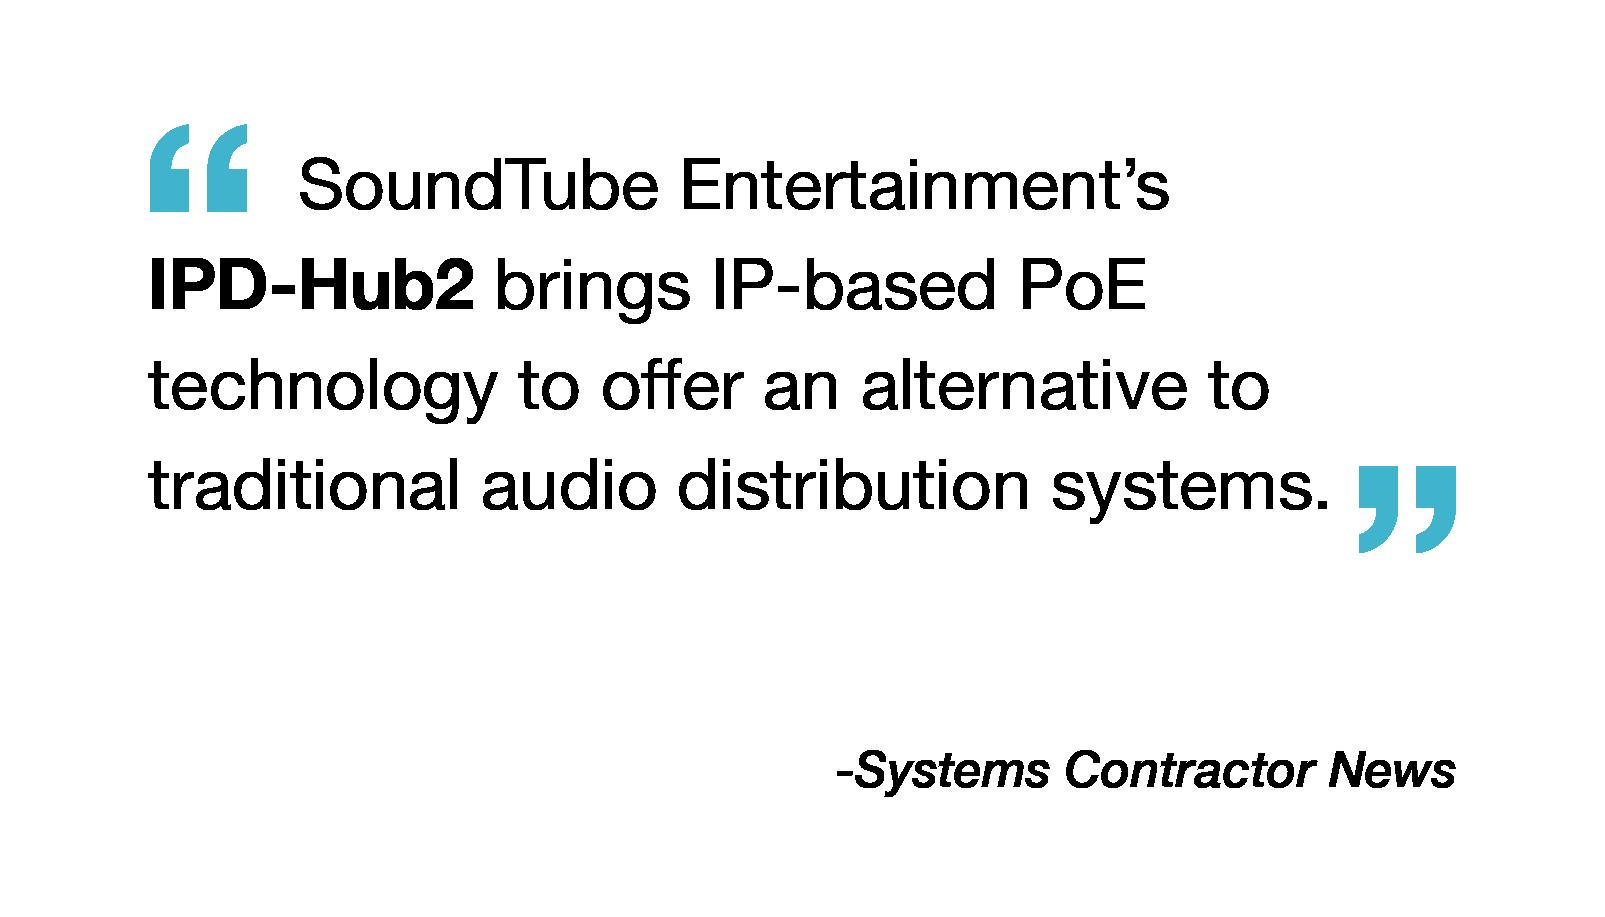 IPD-Hub2